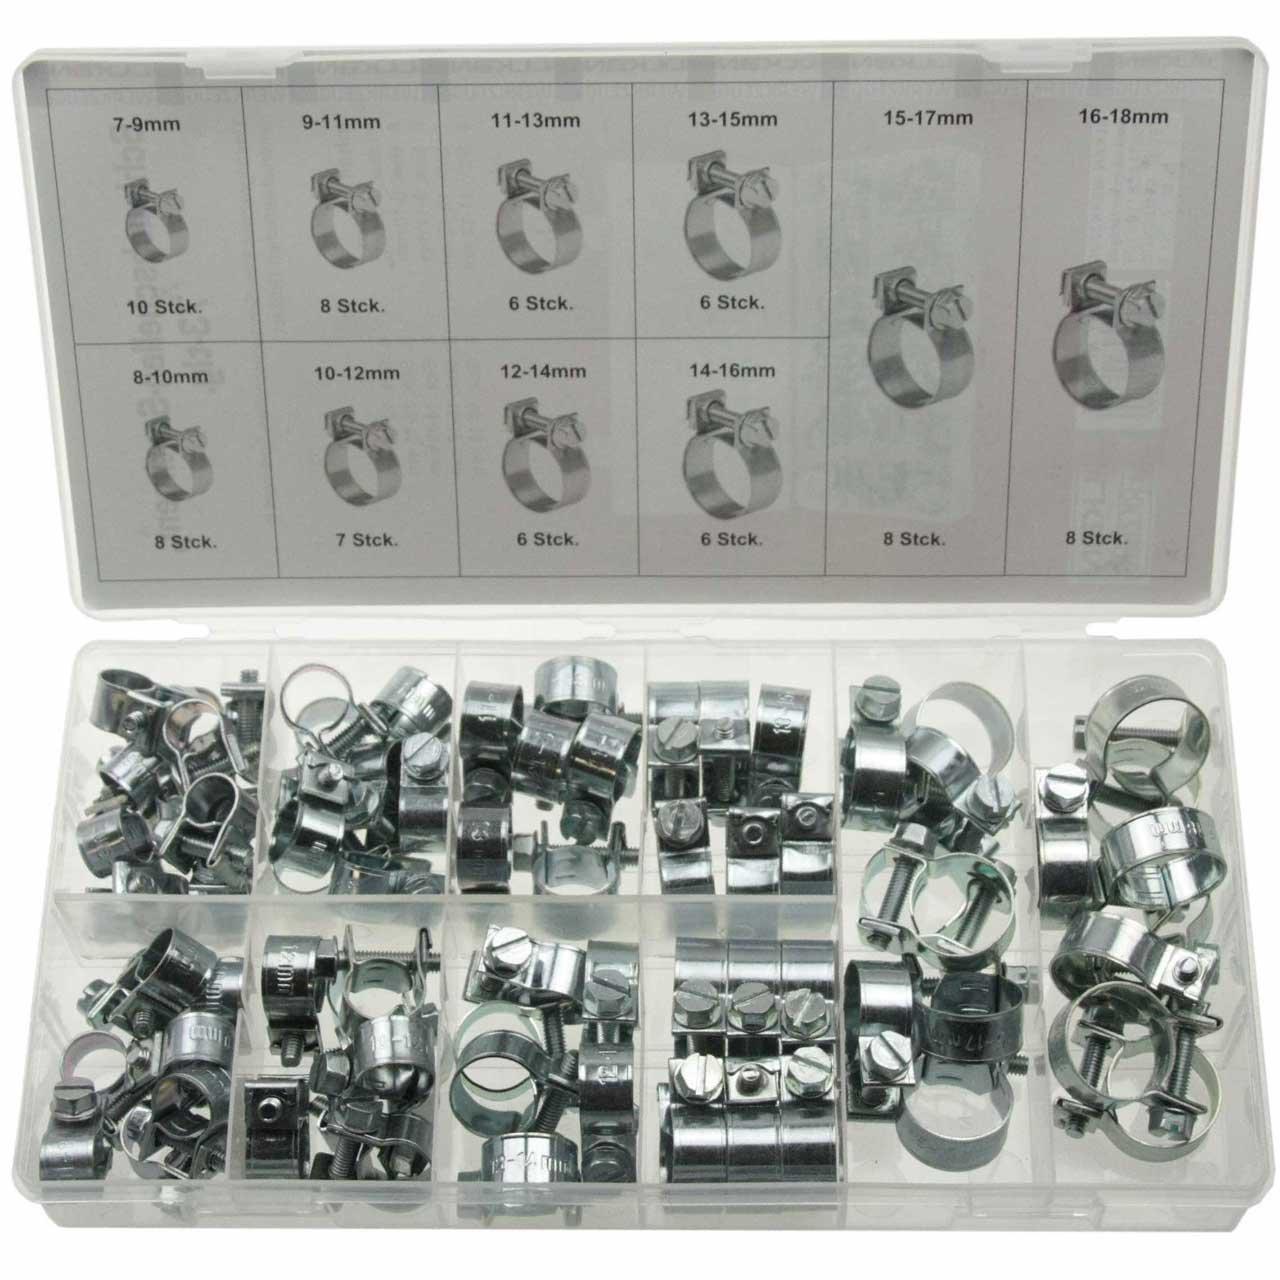 Alkan 73 x Universal Mini mini-colliers de serrage Assortiment de rond zieh Jeu de colliers de fin (Assortiment dans une boî te de rangement/boî te) 56073